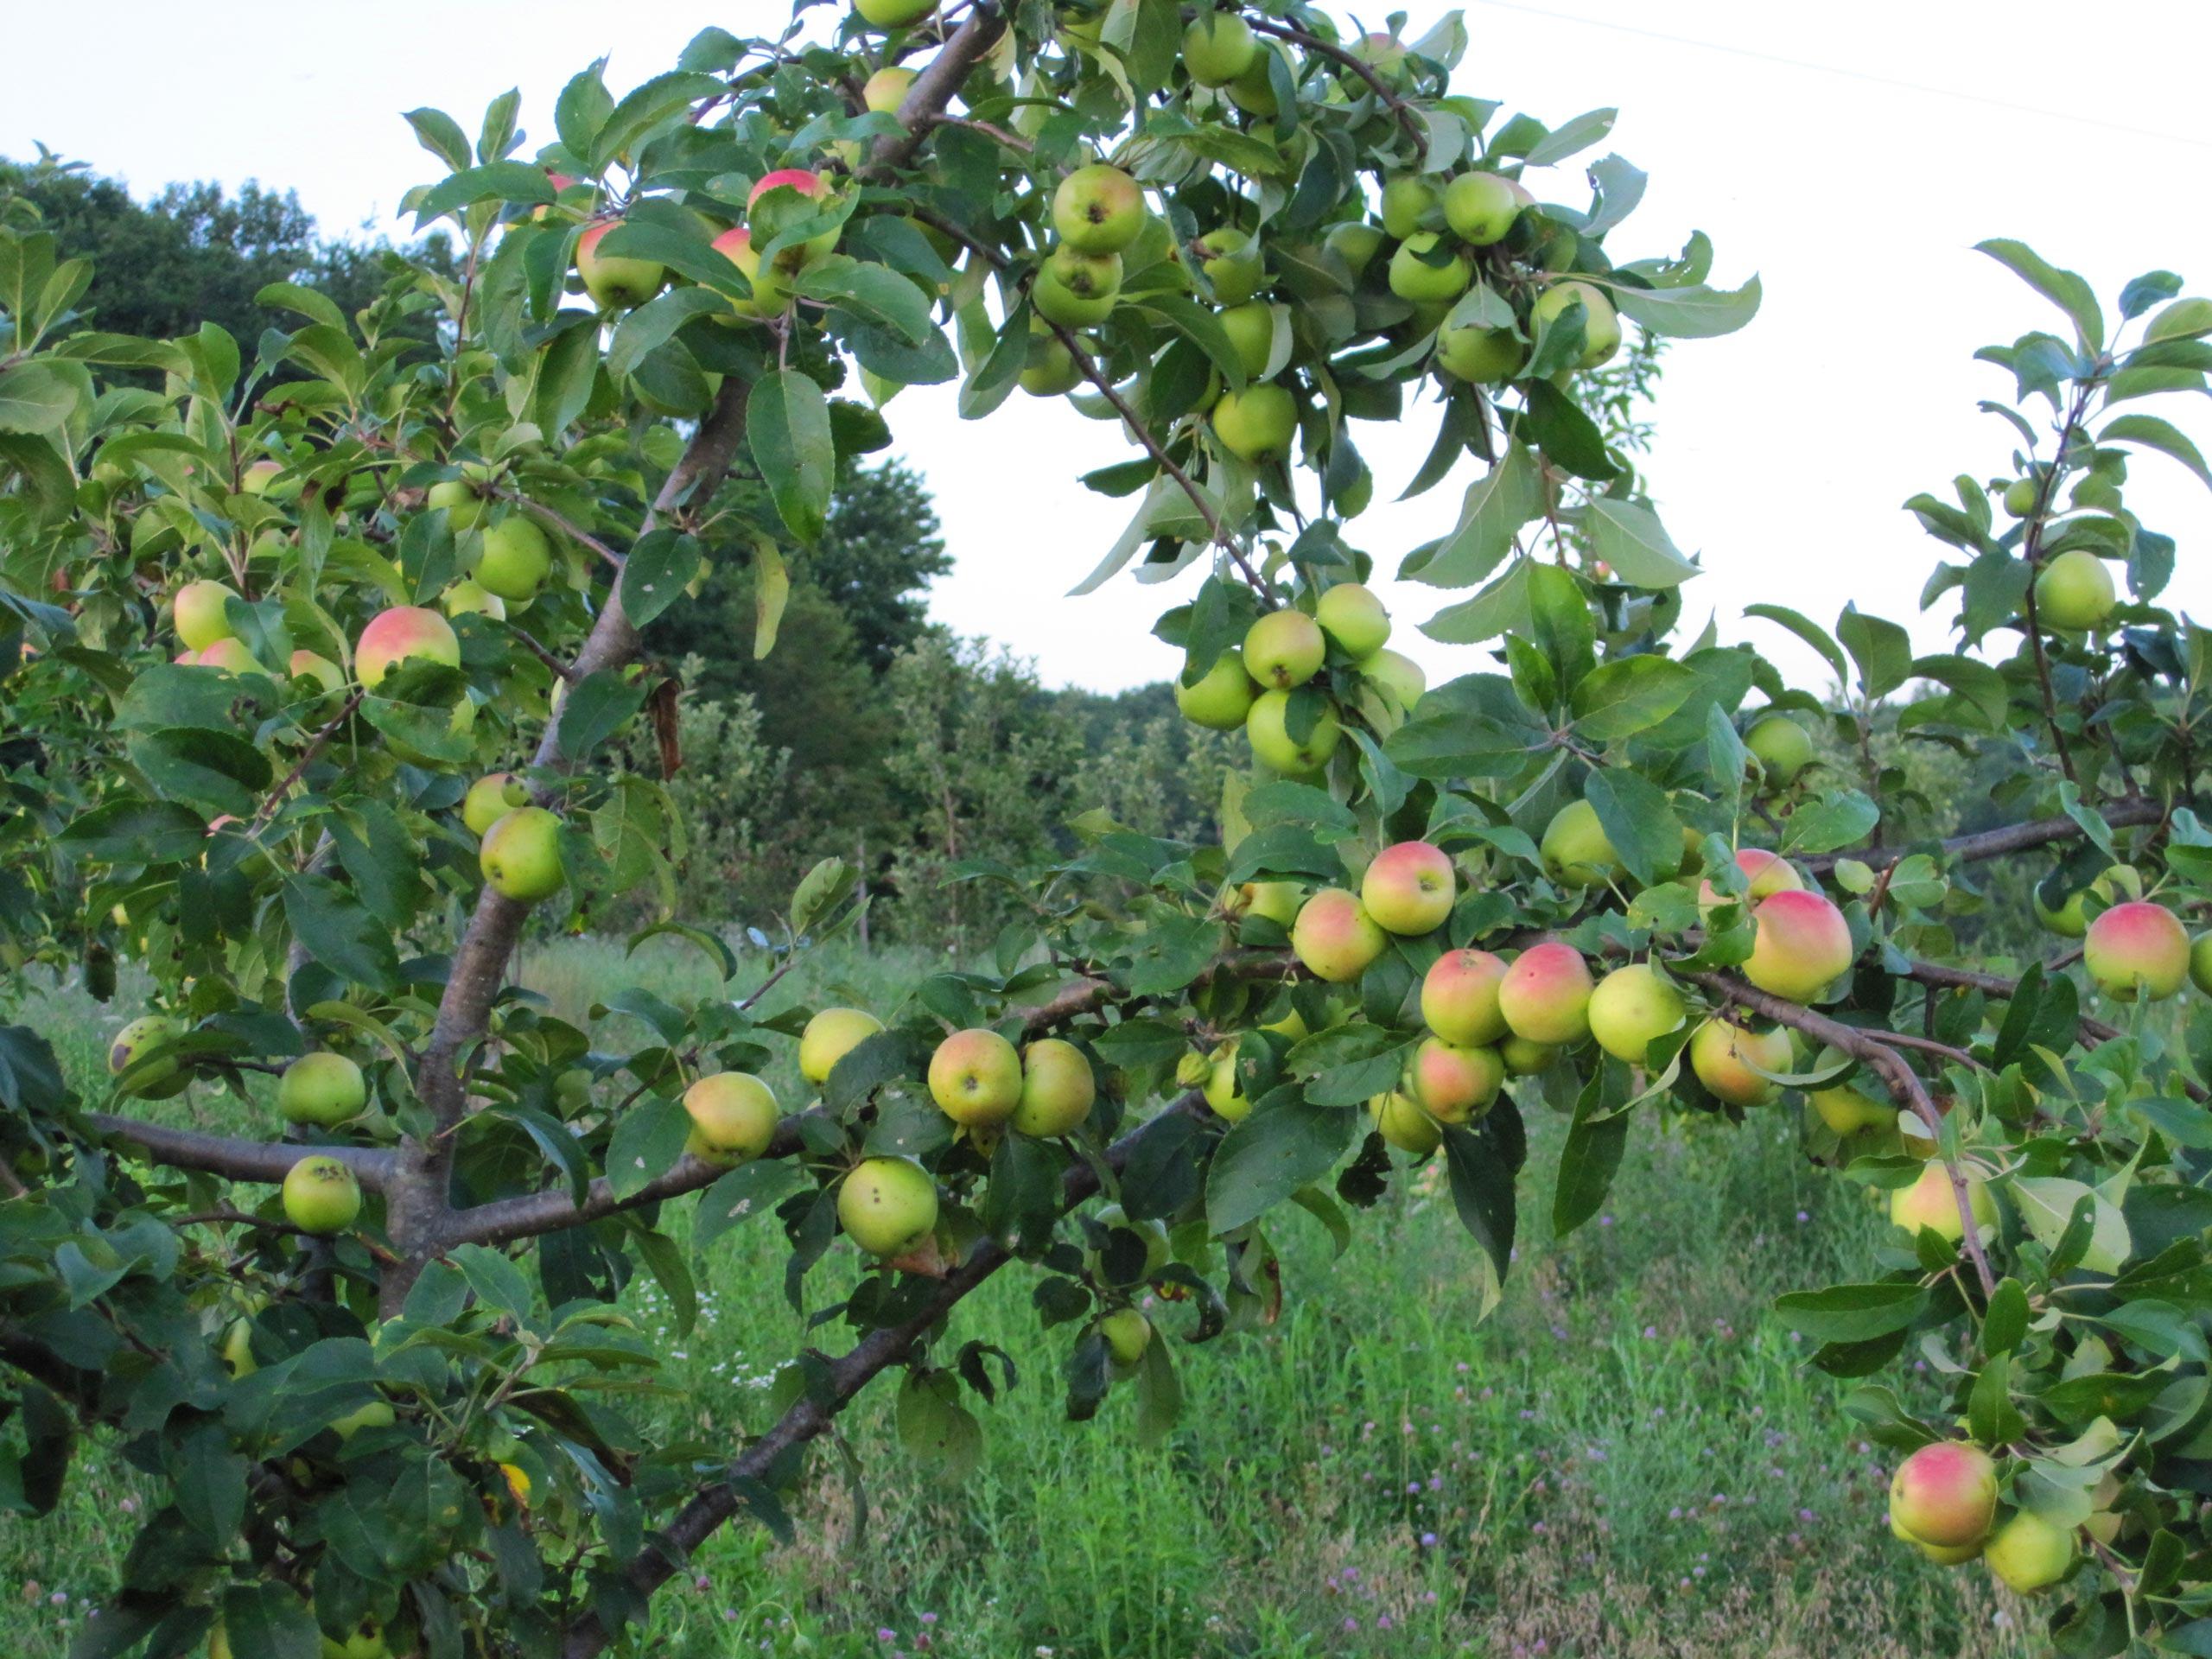 baba-yaga-by-kordick-family-farm-mount-airy-pilot-mountain-north-carolina-apples-cider-syrup-baba-yaga